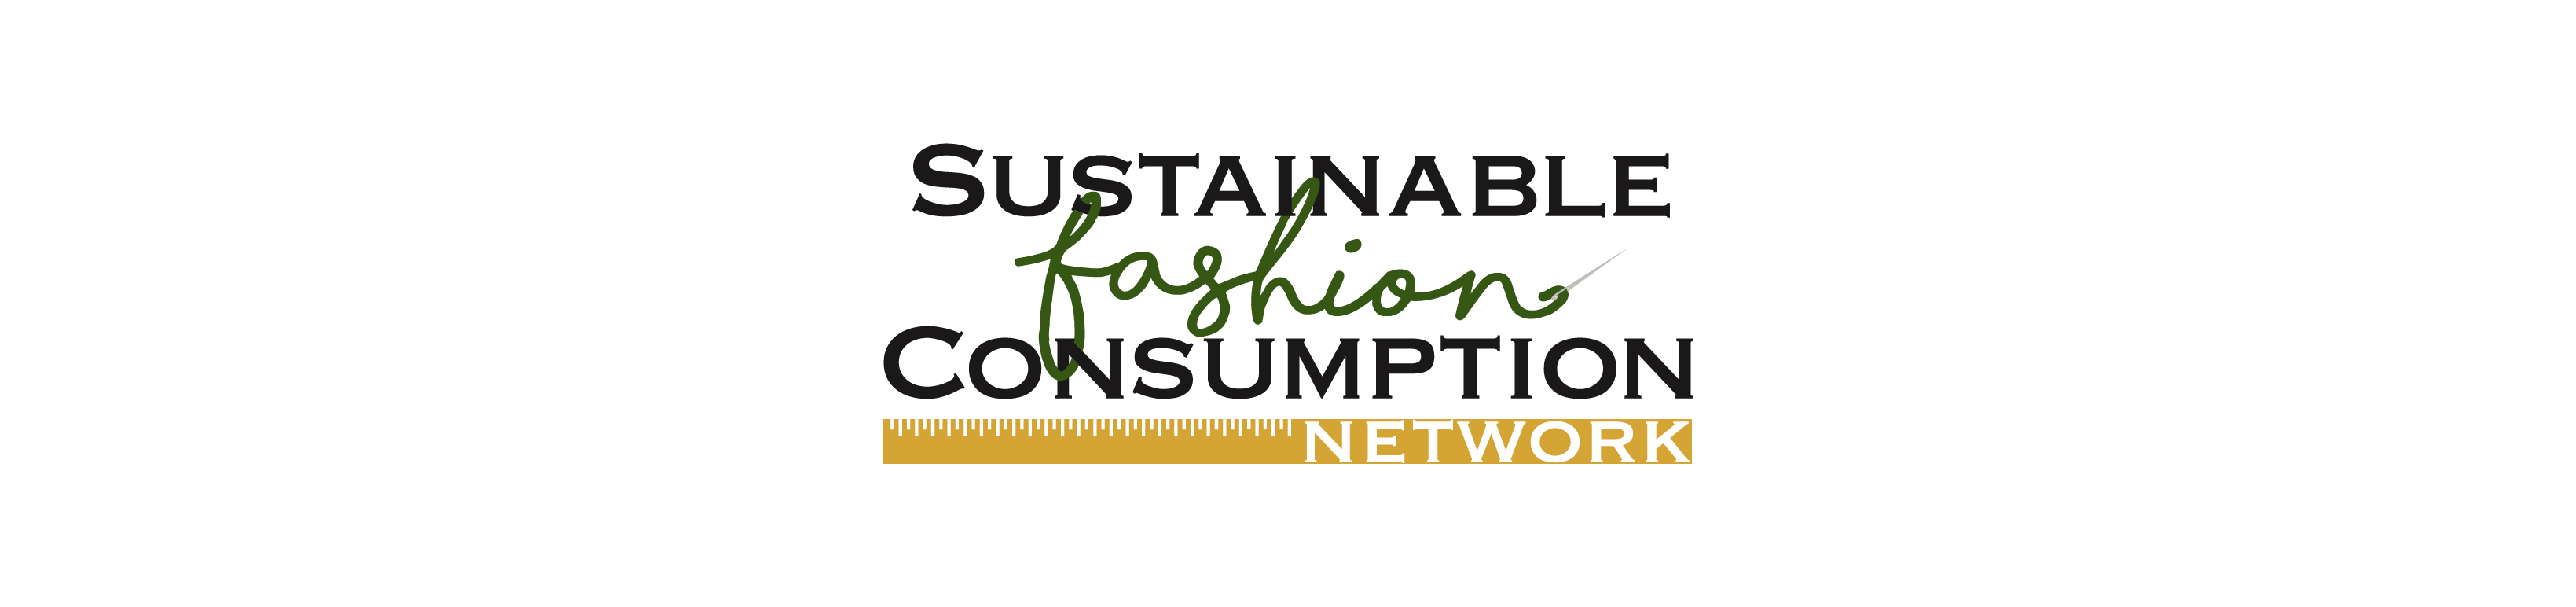 Sustainable Fashion Consumption